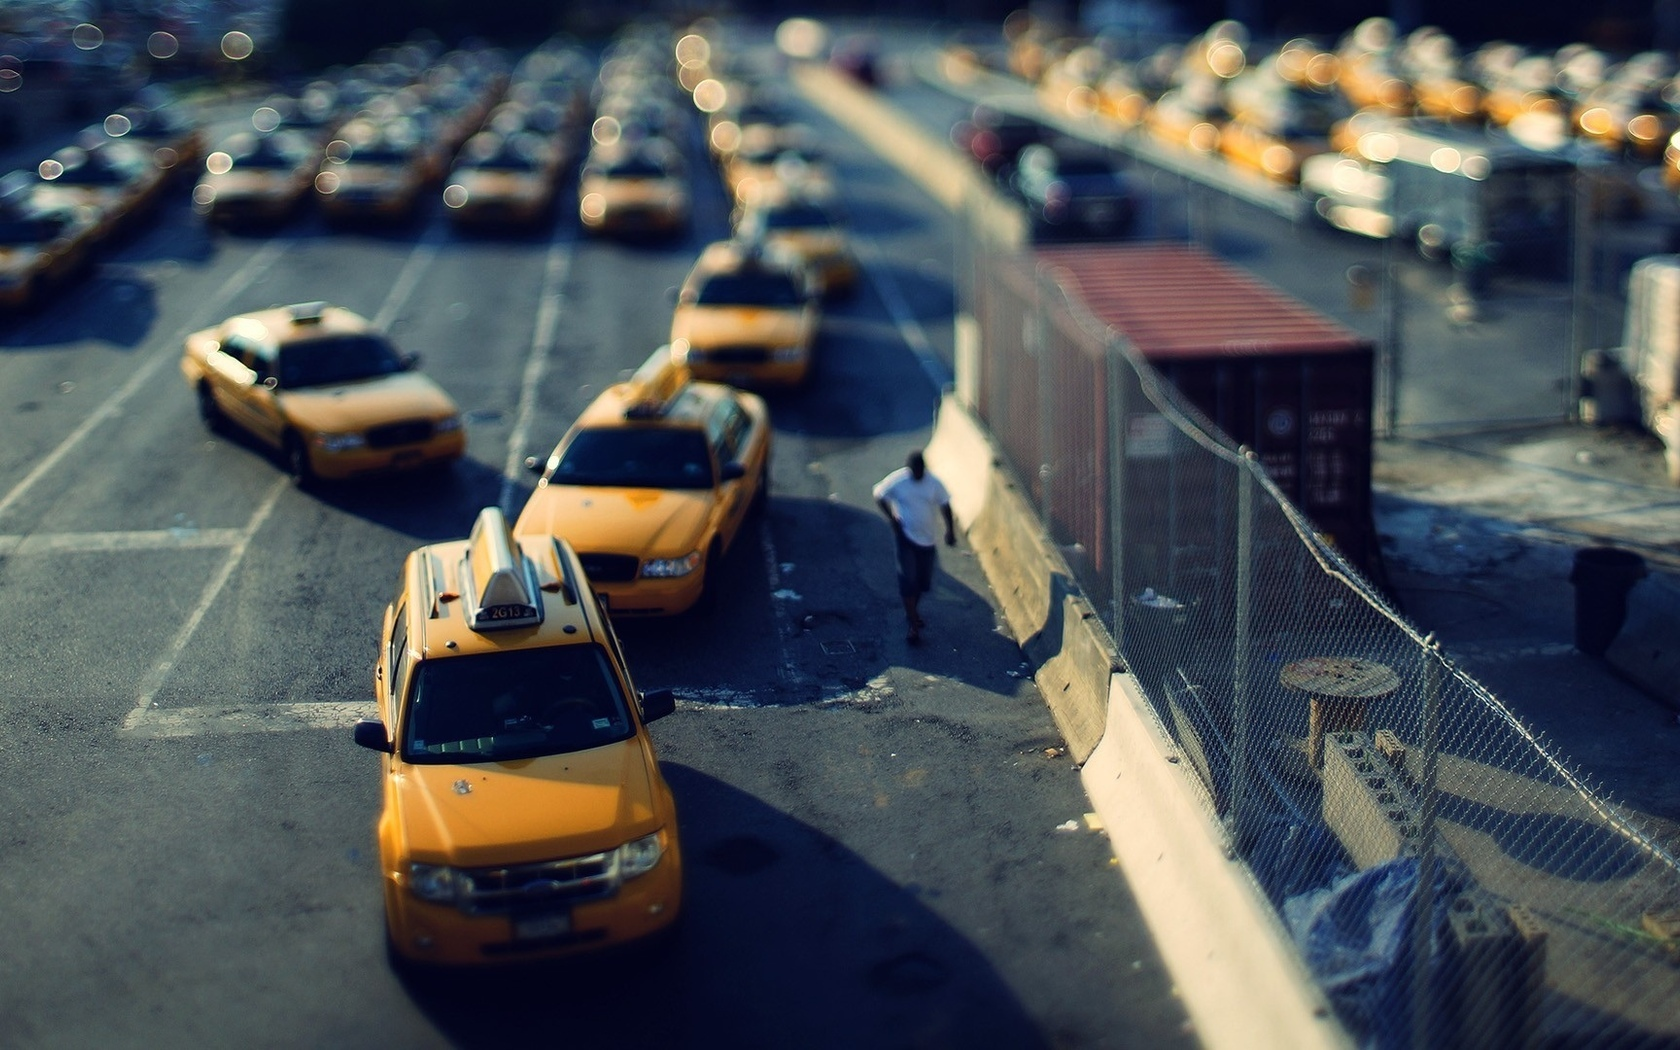 В Мурманске мужчину высадили из маршрутного такси, а он умер